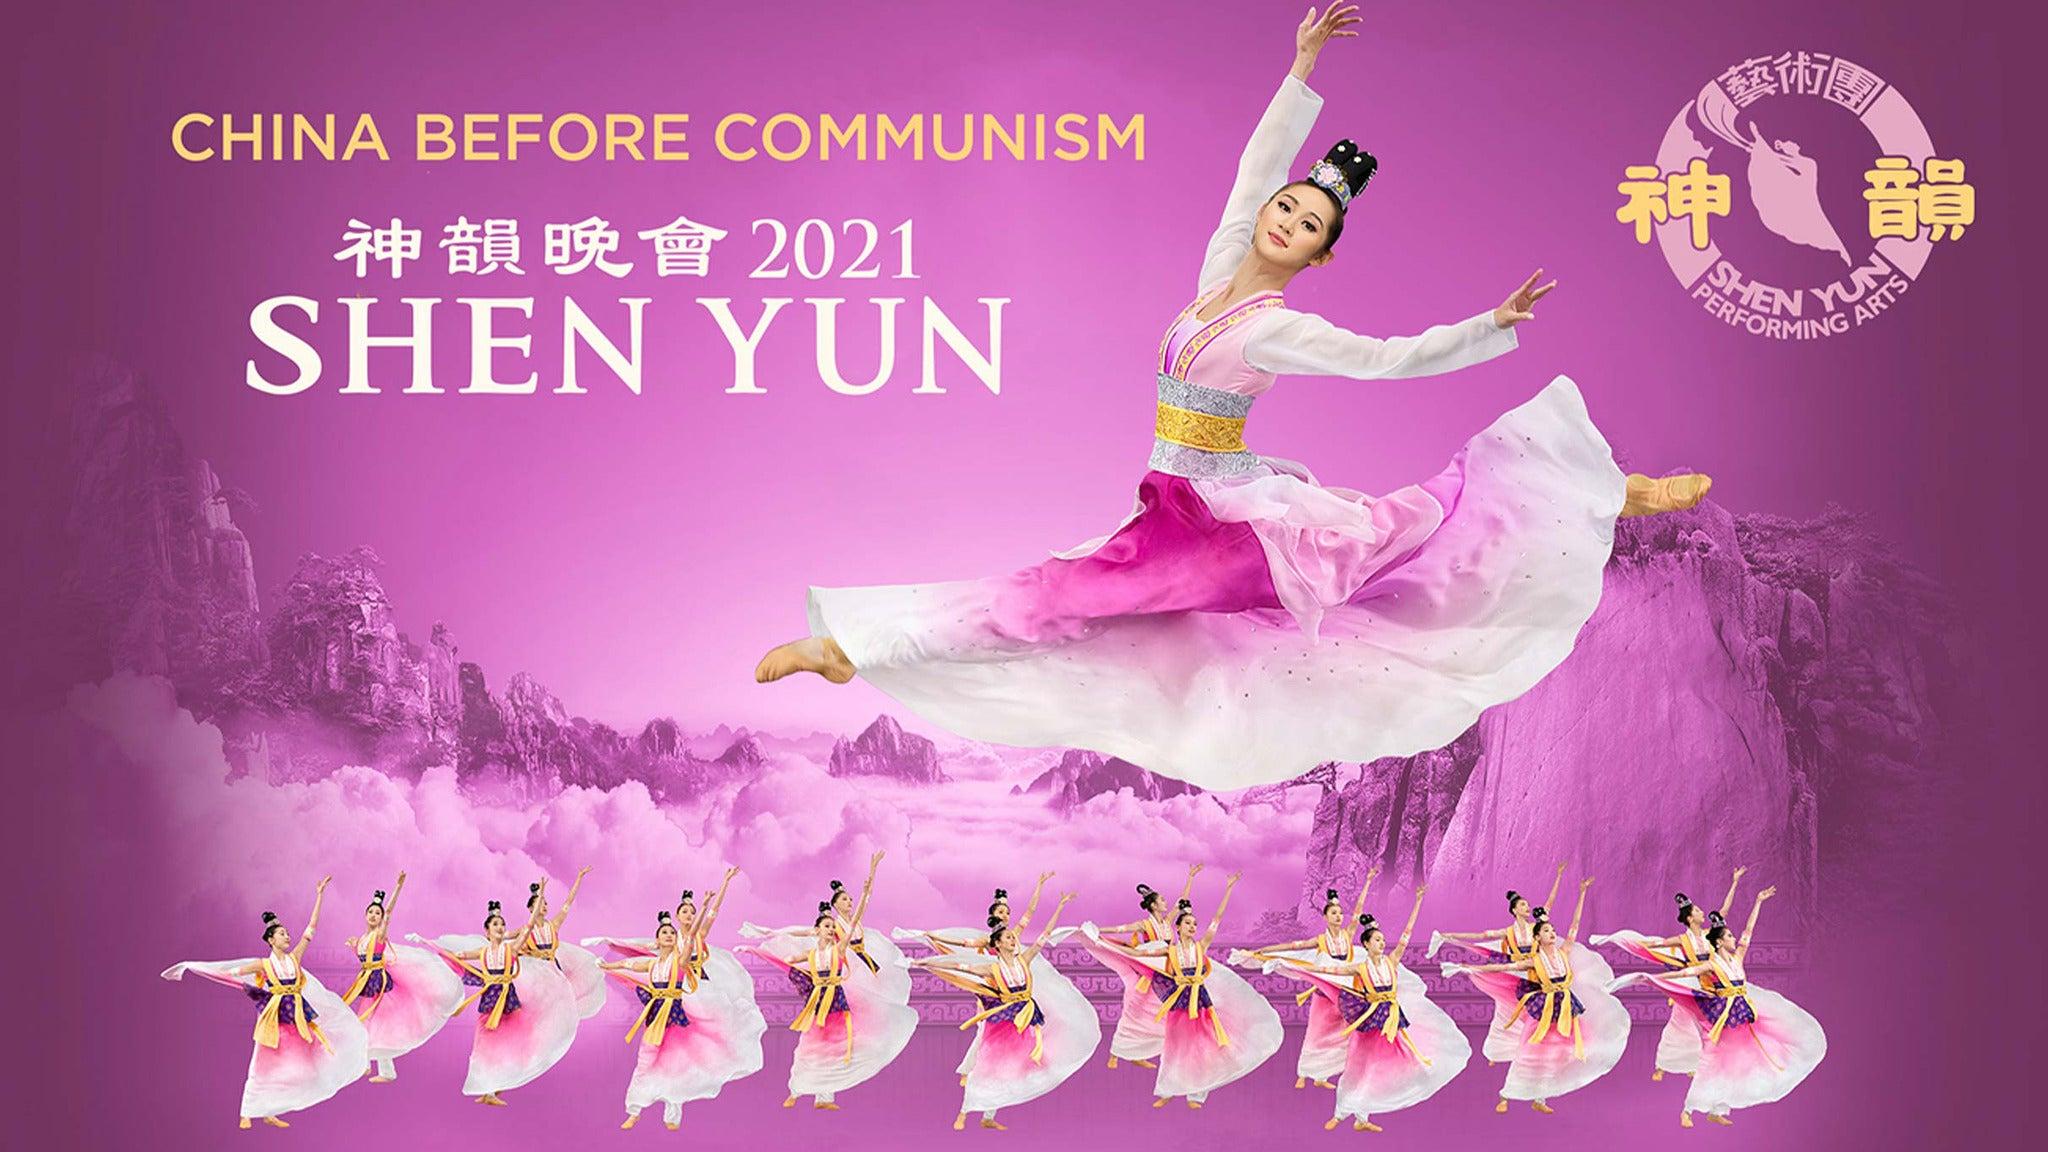 Shen Yun presale passcode